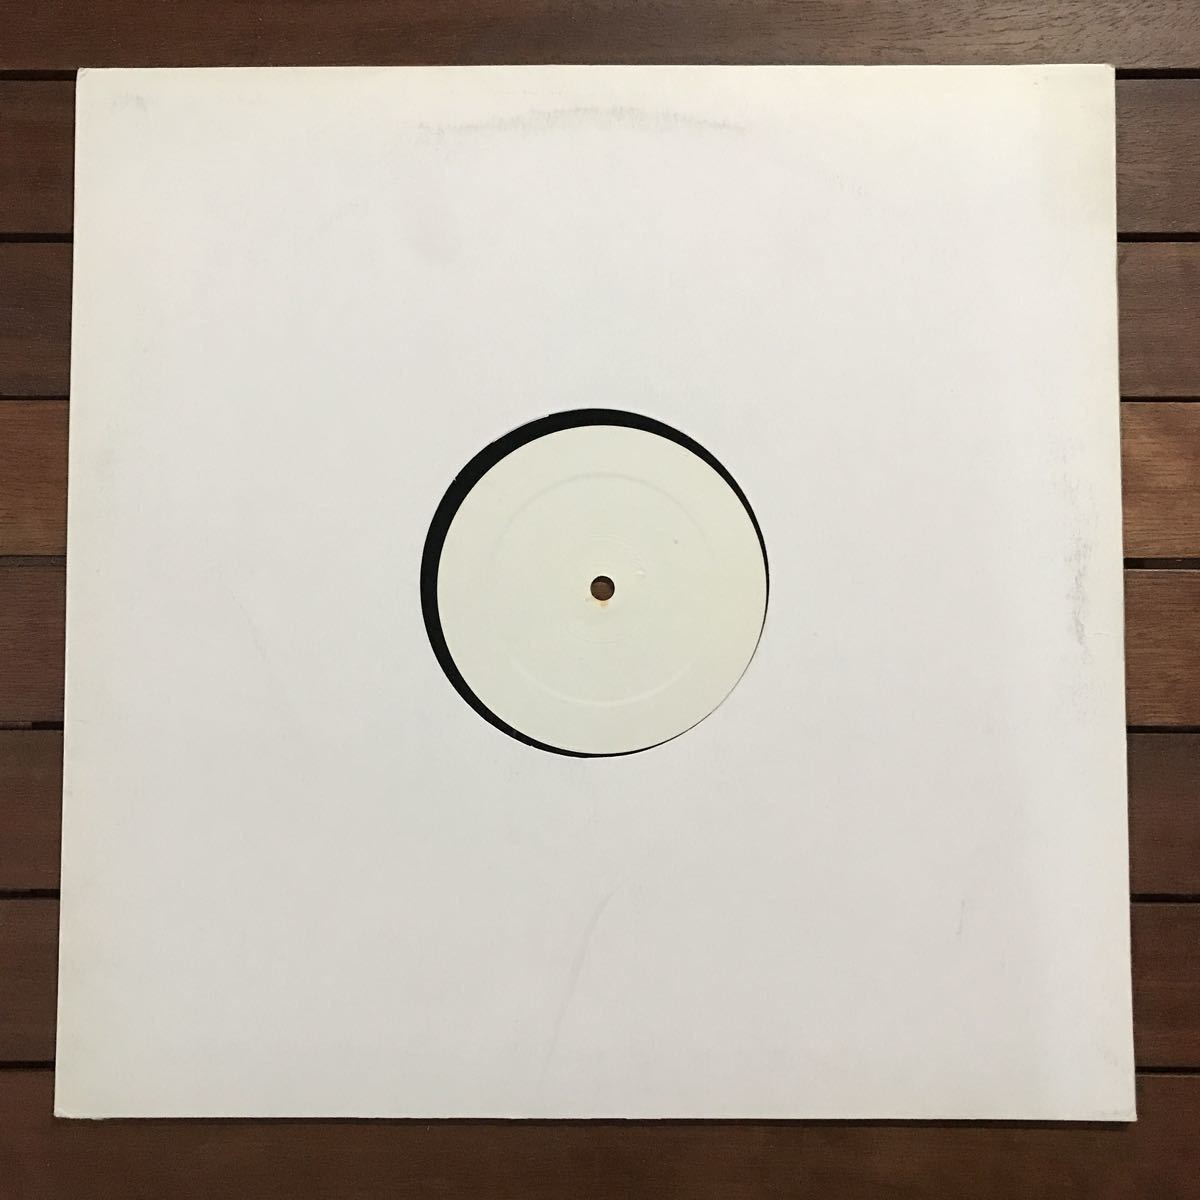 【r&b】Mr. Crambo And The Go-Go Rappers / Ola-Ola-Ola[12inch]オリジナル盤《3-2-24 9595》